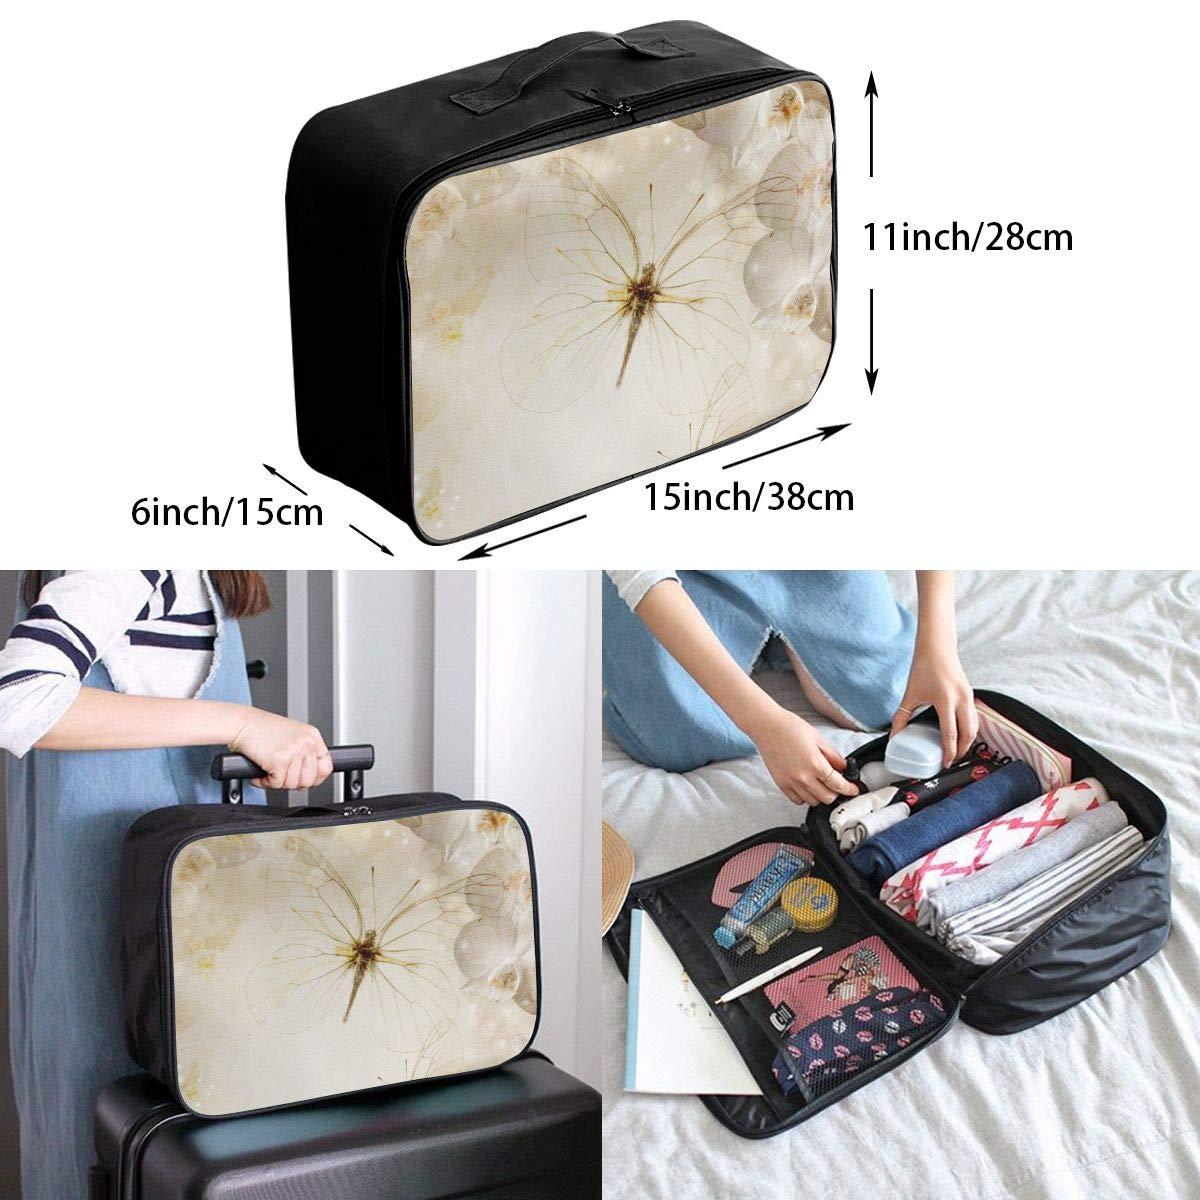 Canvas Travel Weekender Bag,Fashion Custom Lightweight Large Capacity Portable Luggage Bag,Suitcase Trolley Bag ADGAI Lovely Dragonfly 4